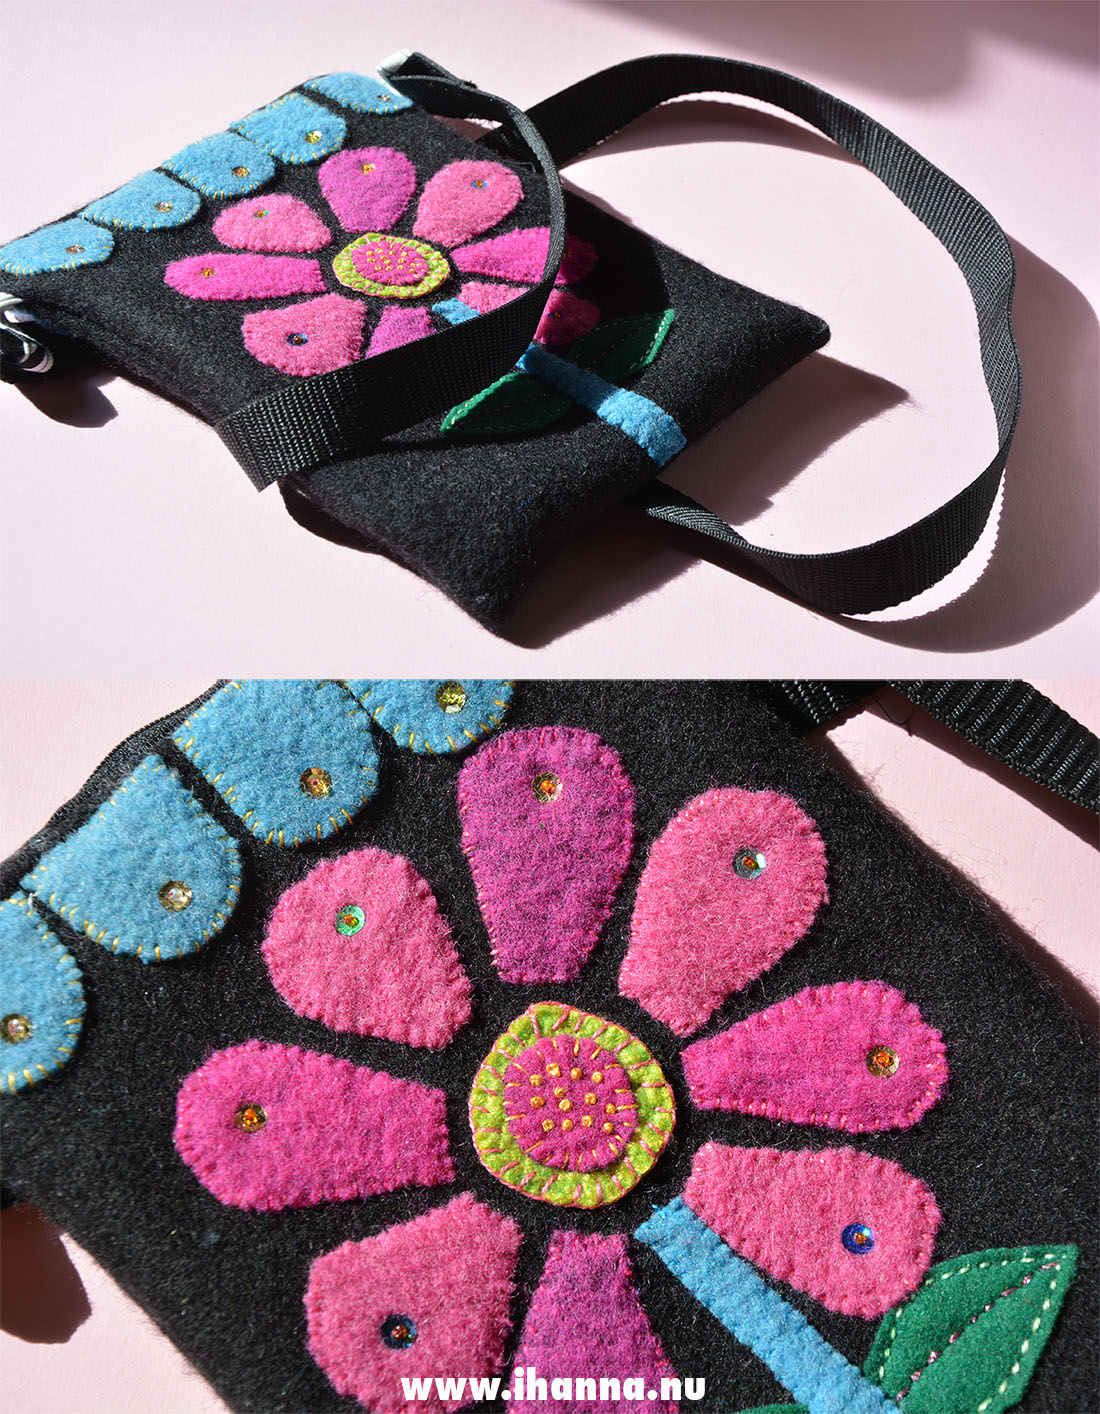 A hand-made wool embroidered handbag by Hanna Andersson aka iHanna